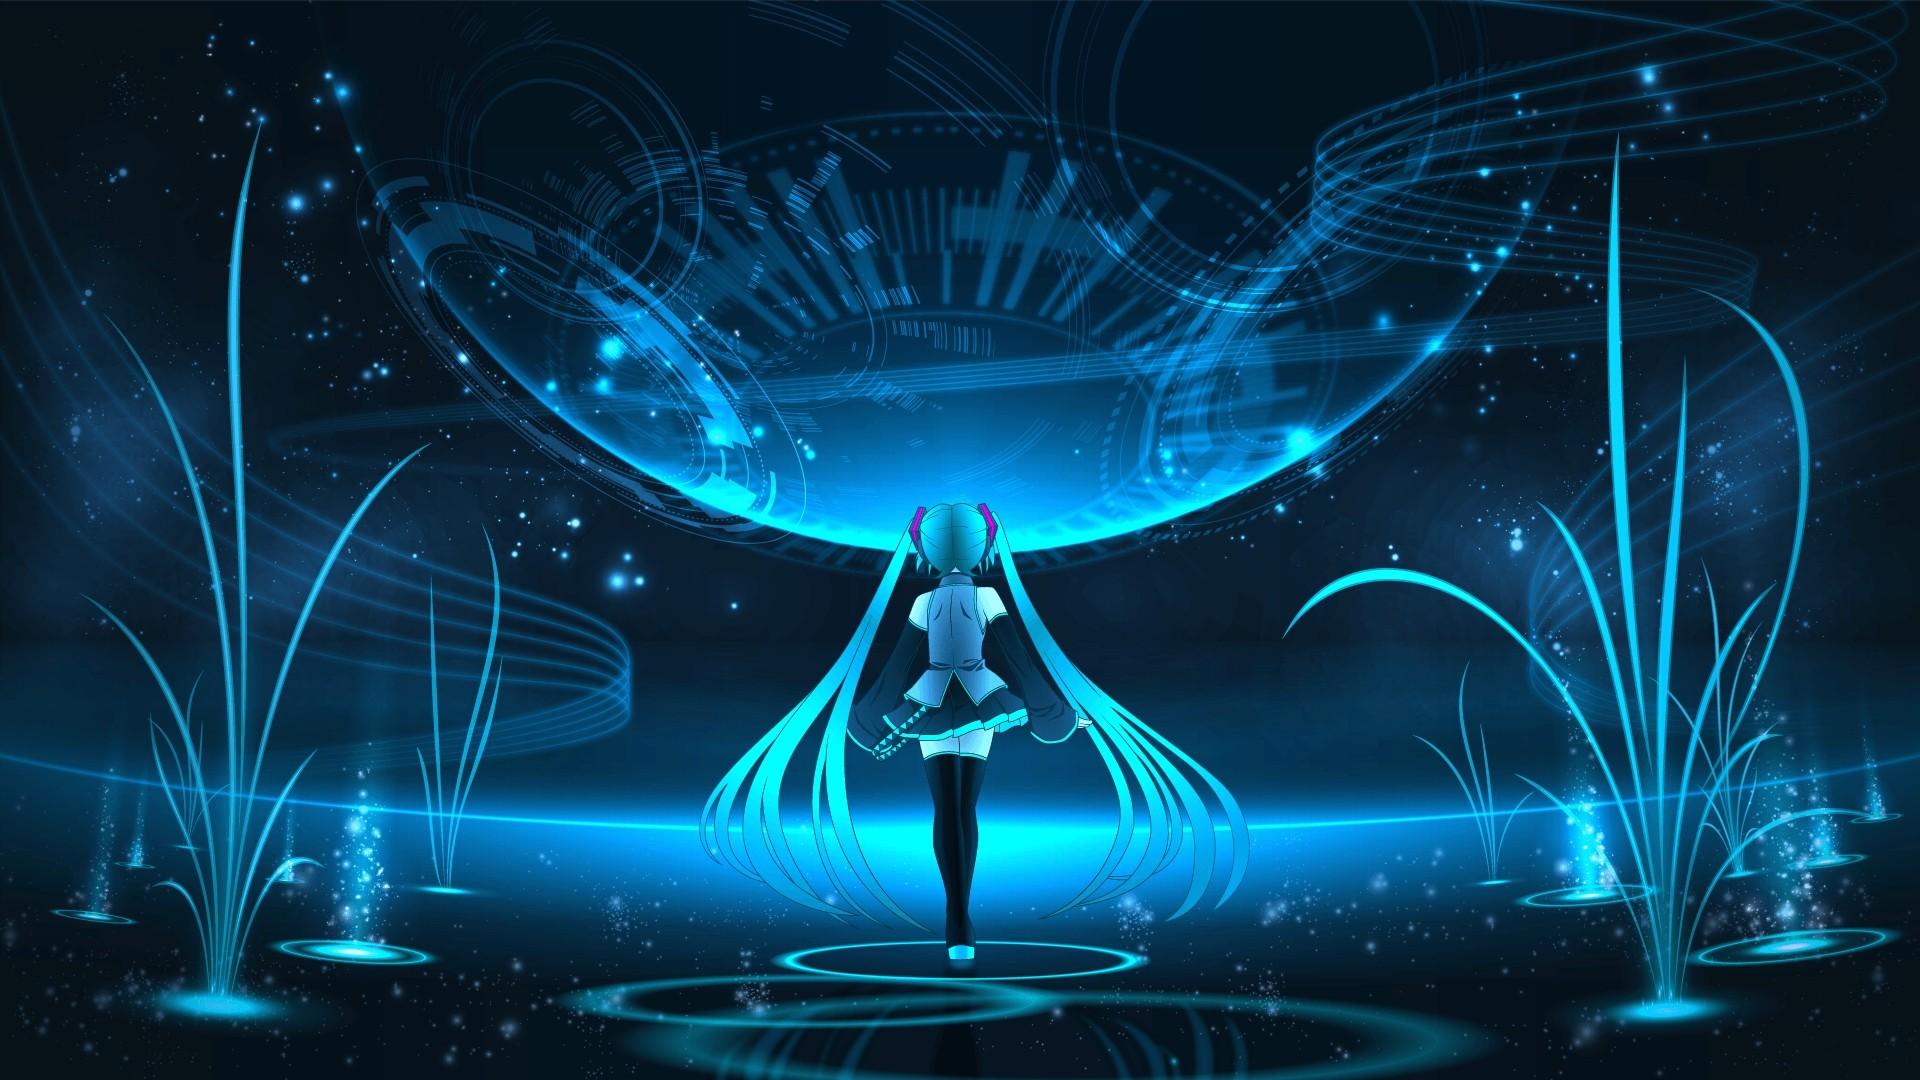 Anime Night Neon Desktop Wallpaper